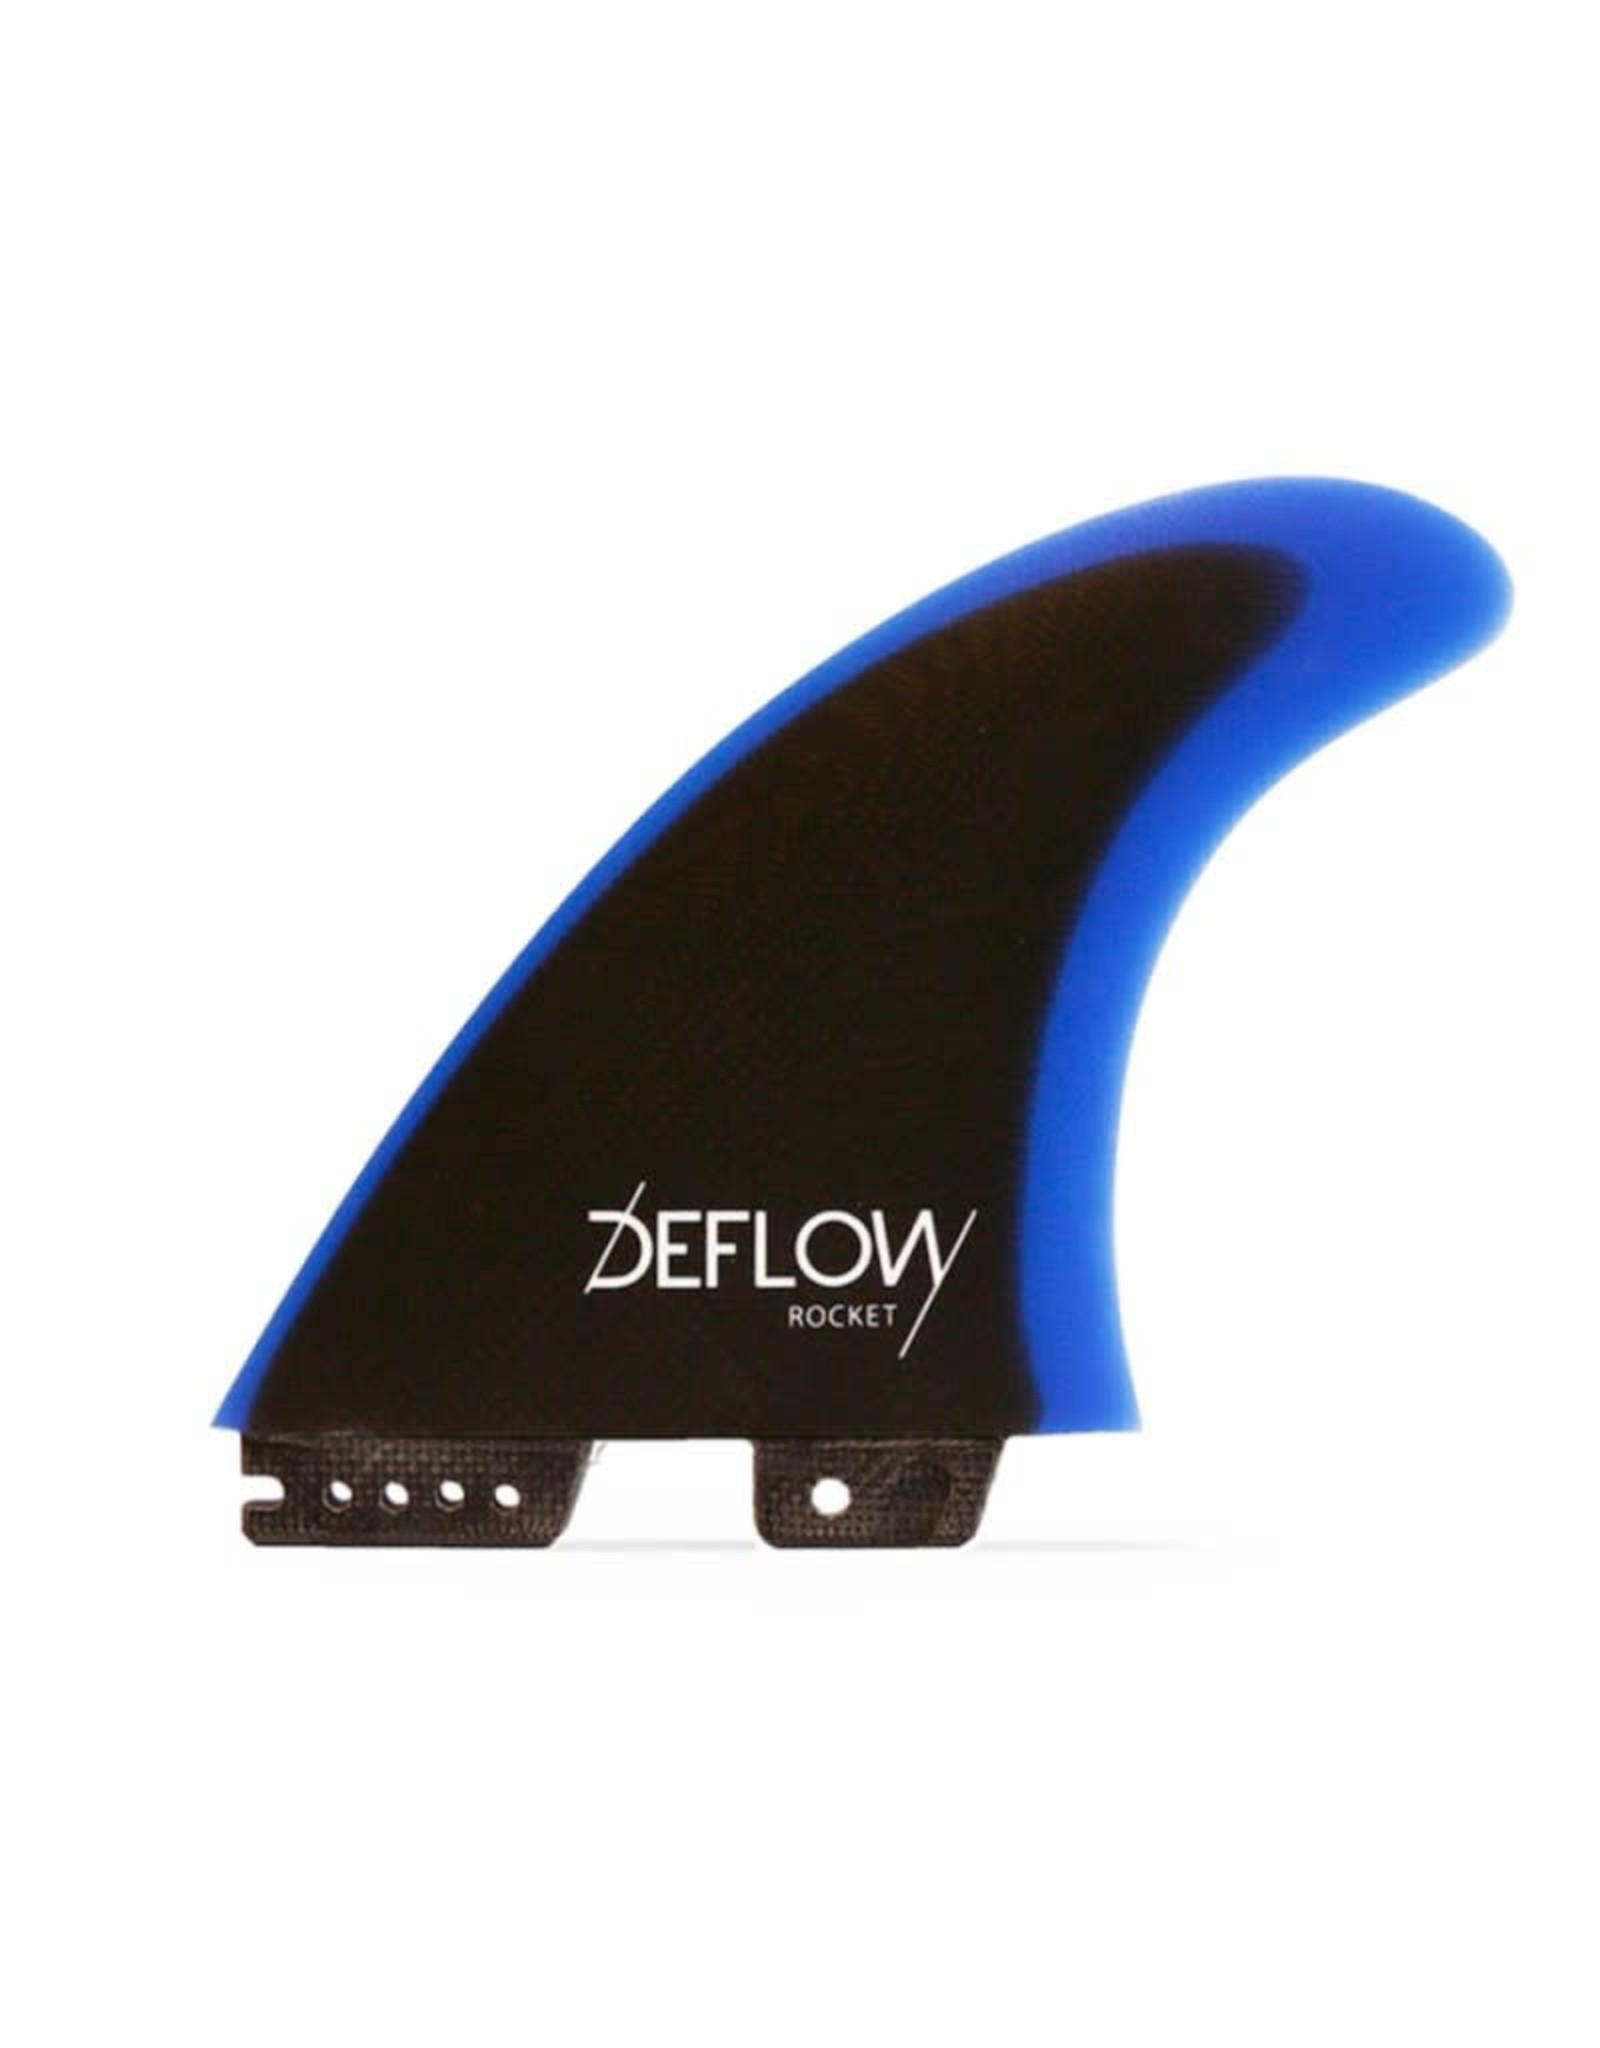 Deflow Deflow Rocket Trhuster FCSII